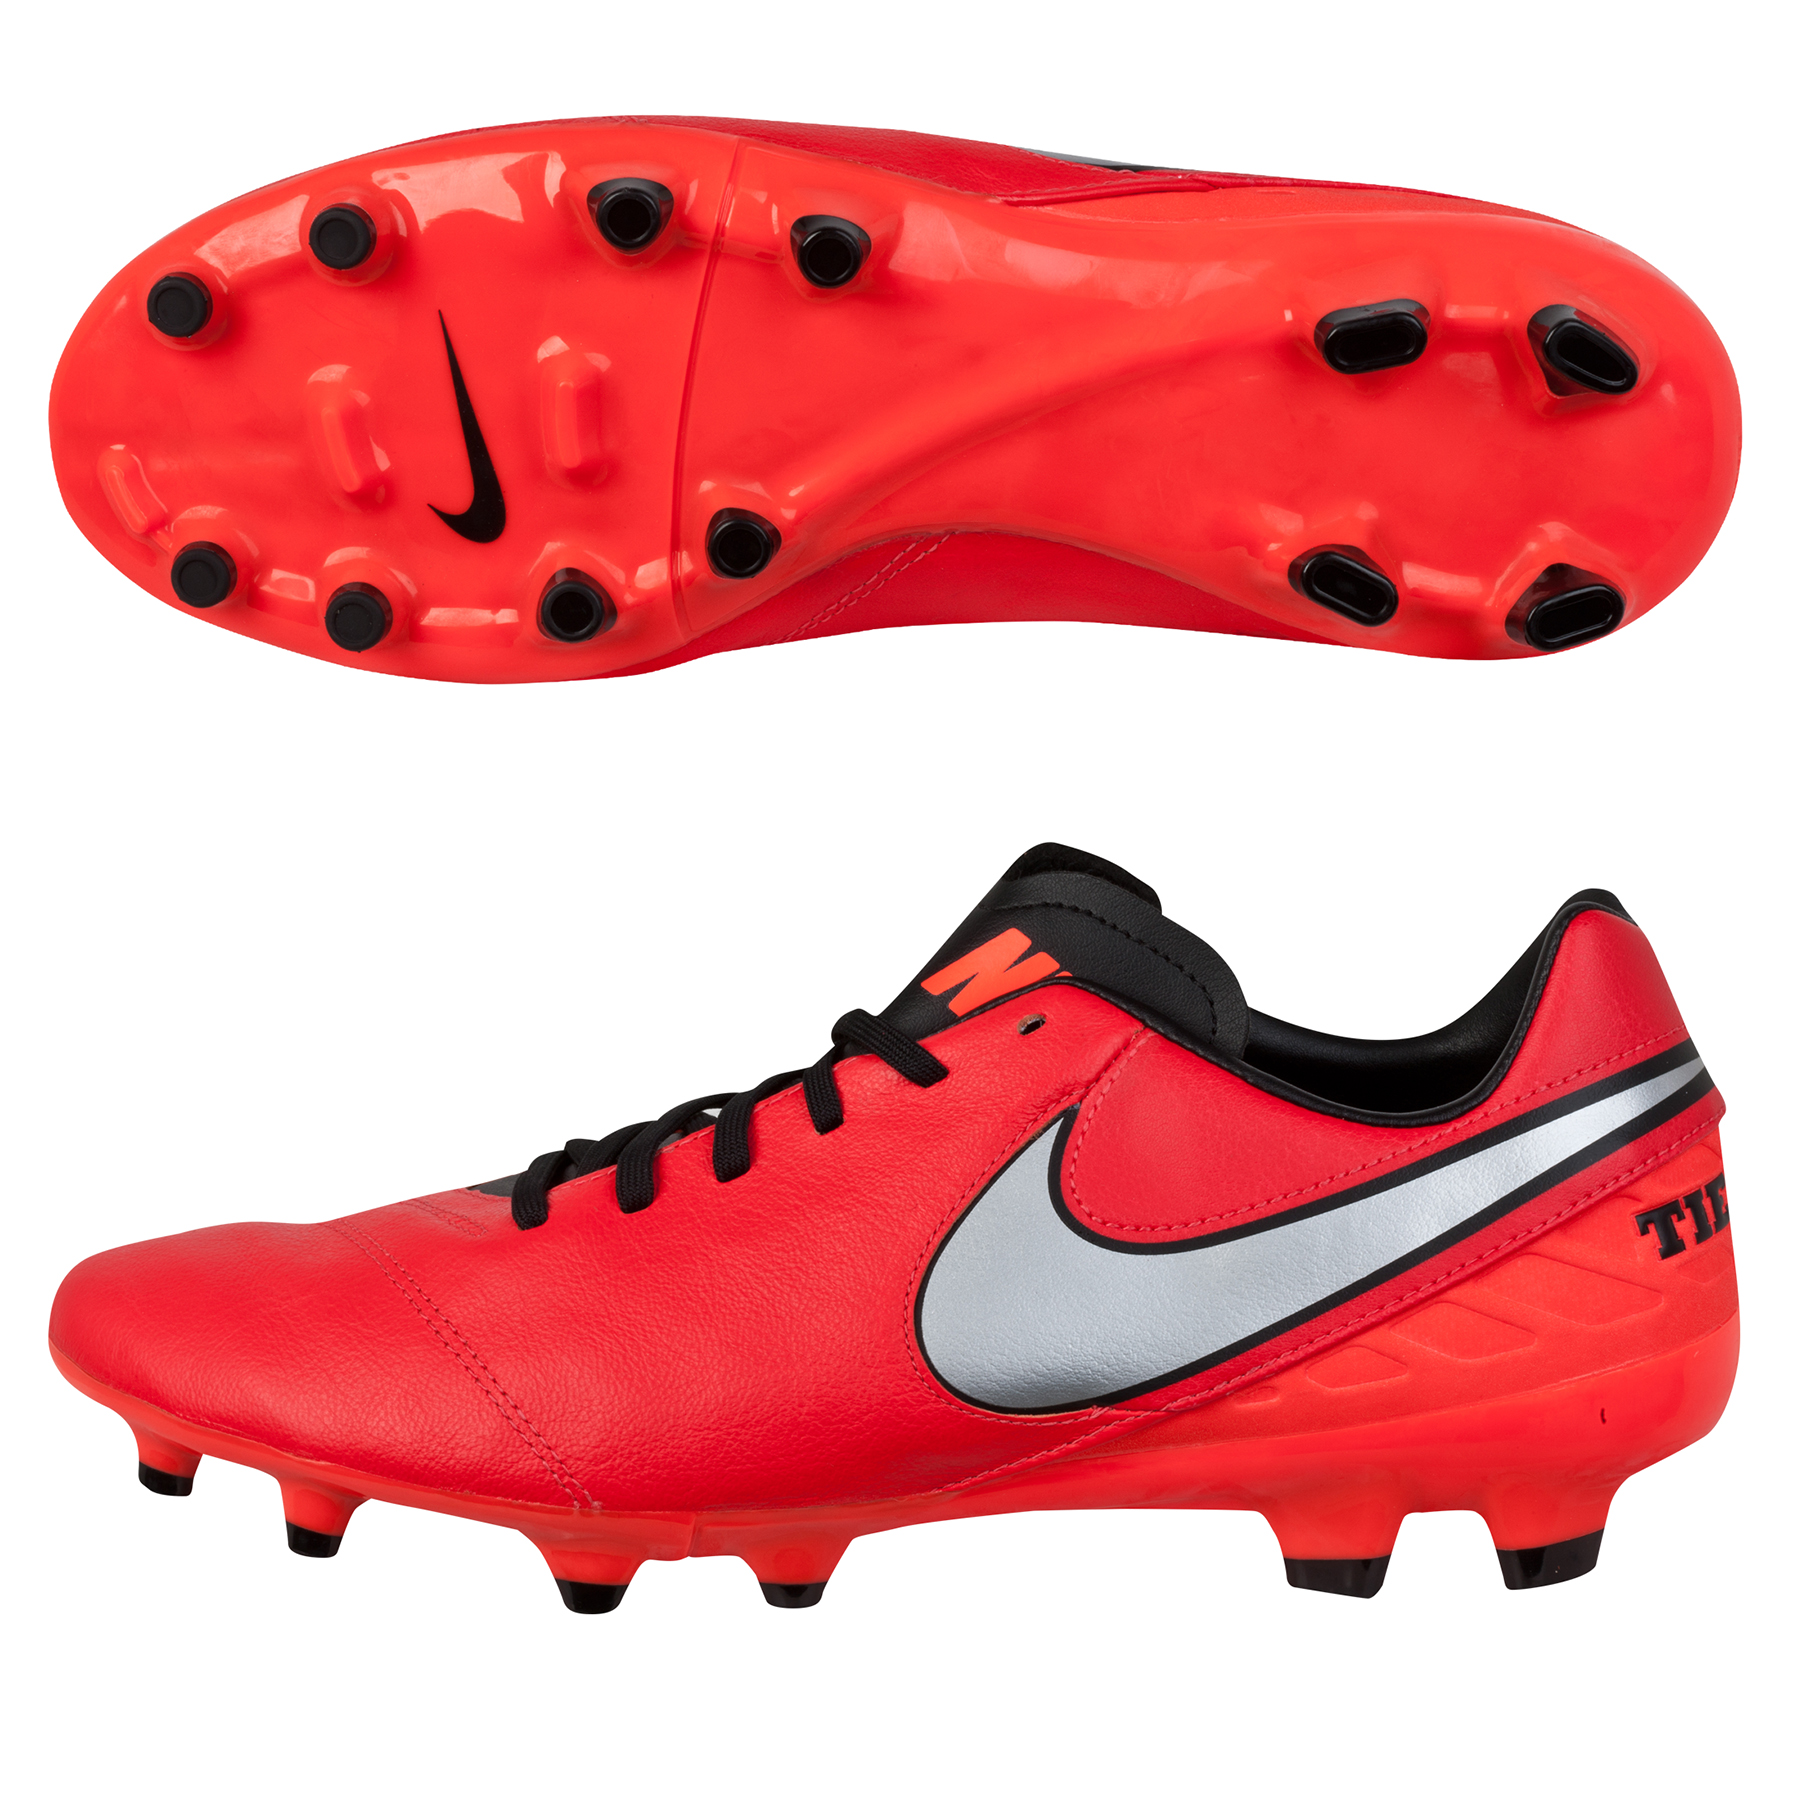 Nike Tiempo Mystic V FG Red